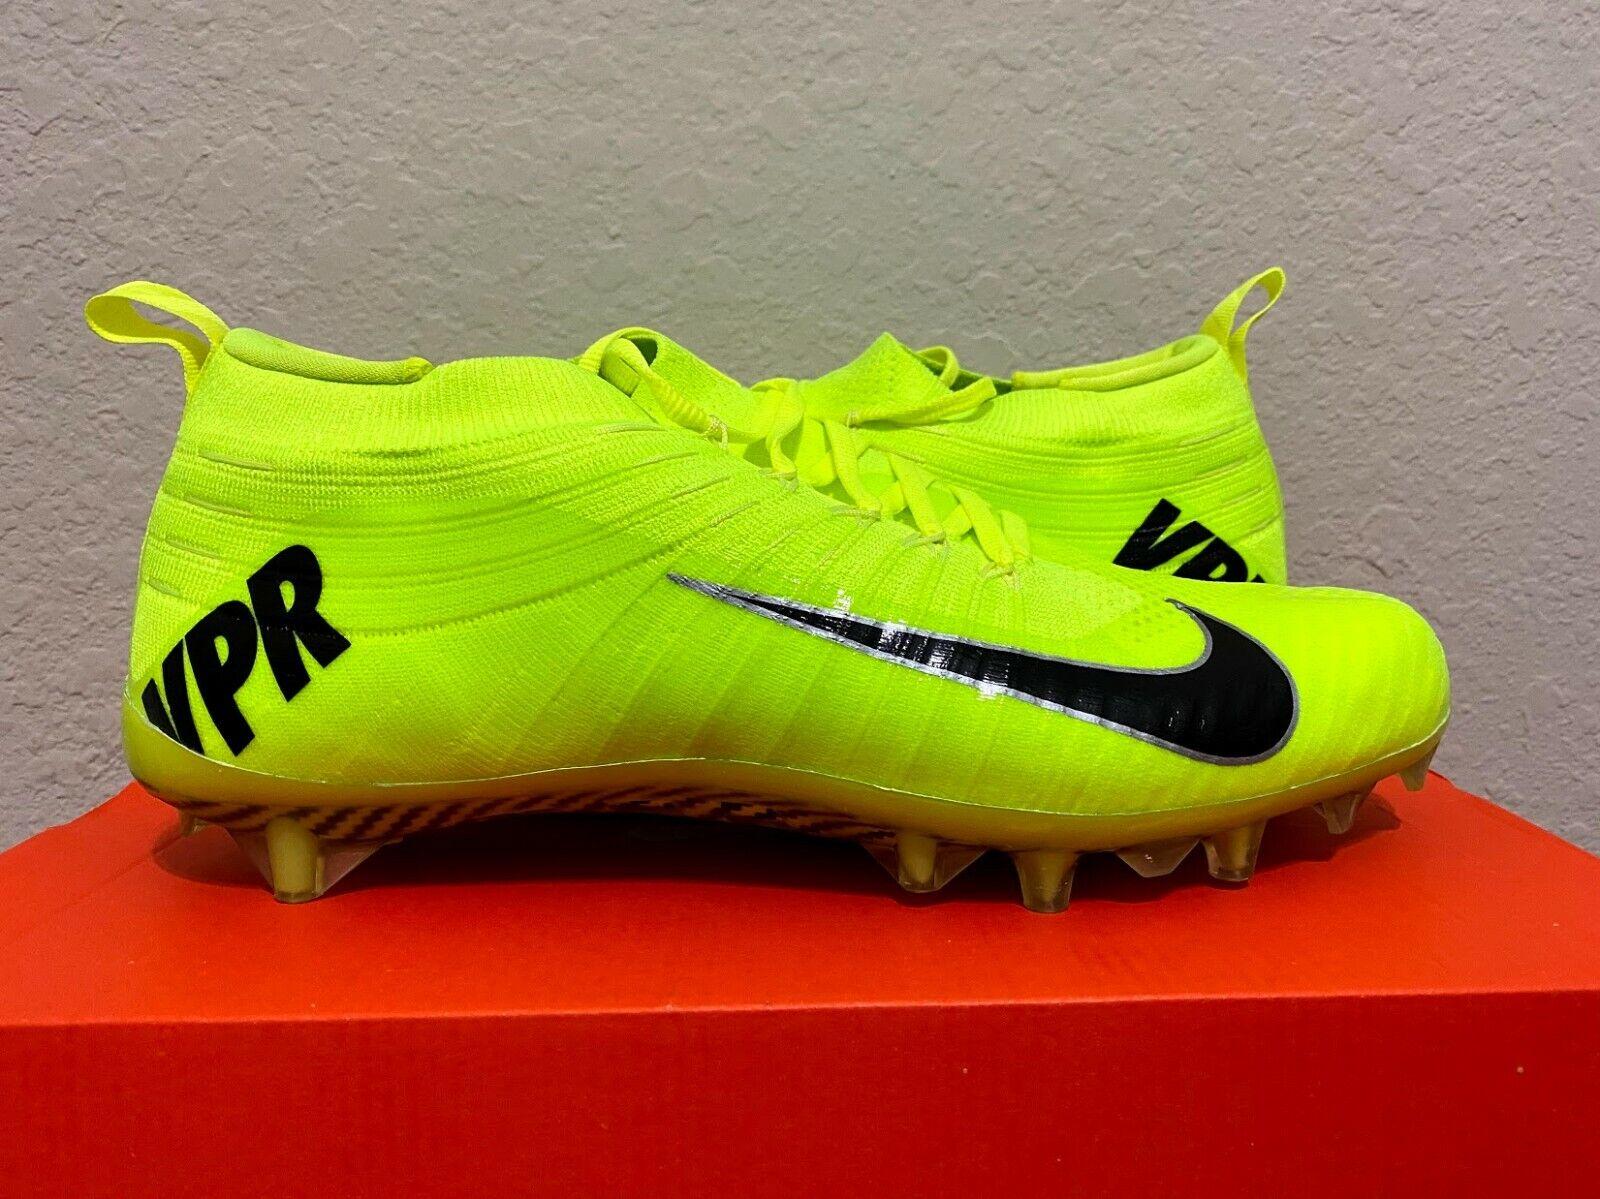 Nike Vapor Ultimate TD Football Cleats